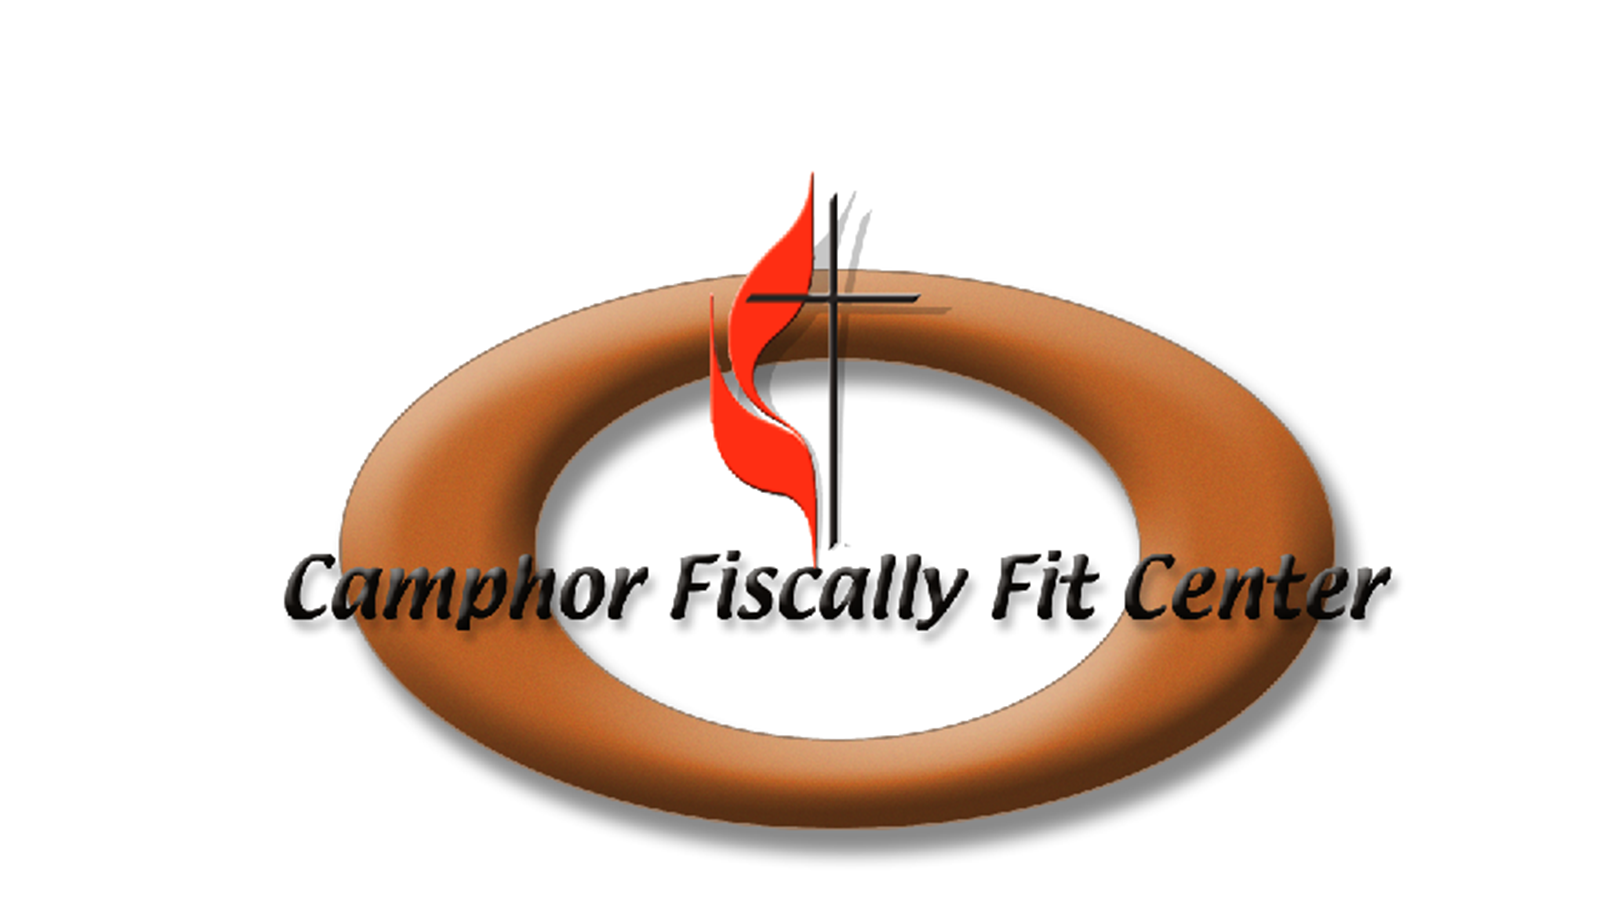 Camphor Fiscally Fit Center logo